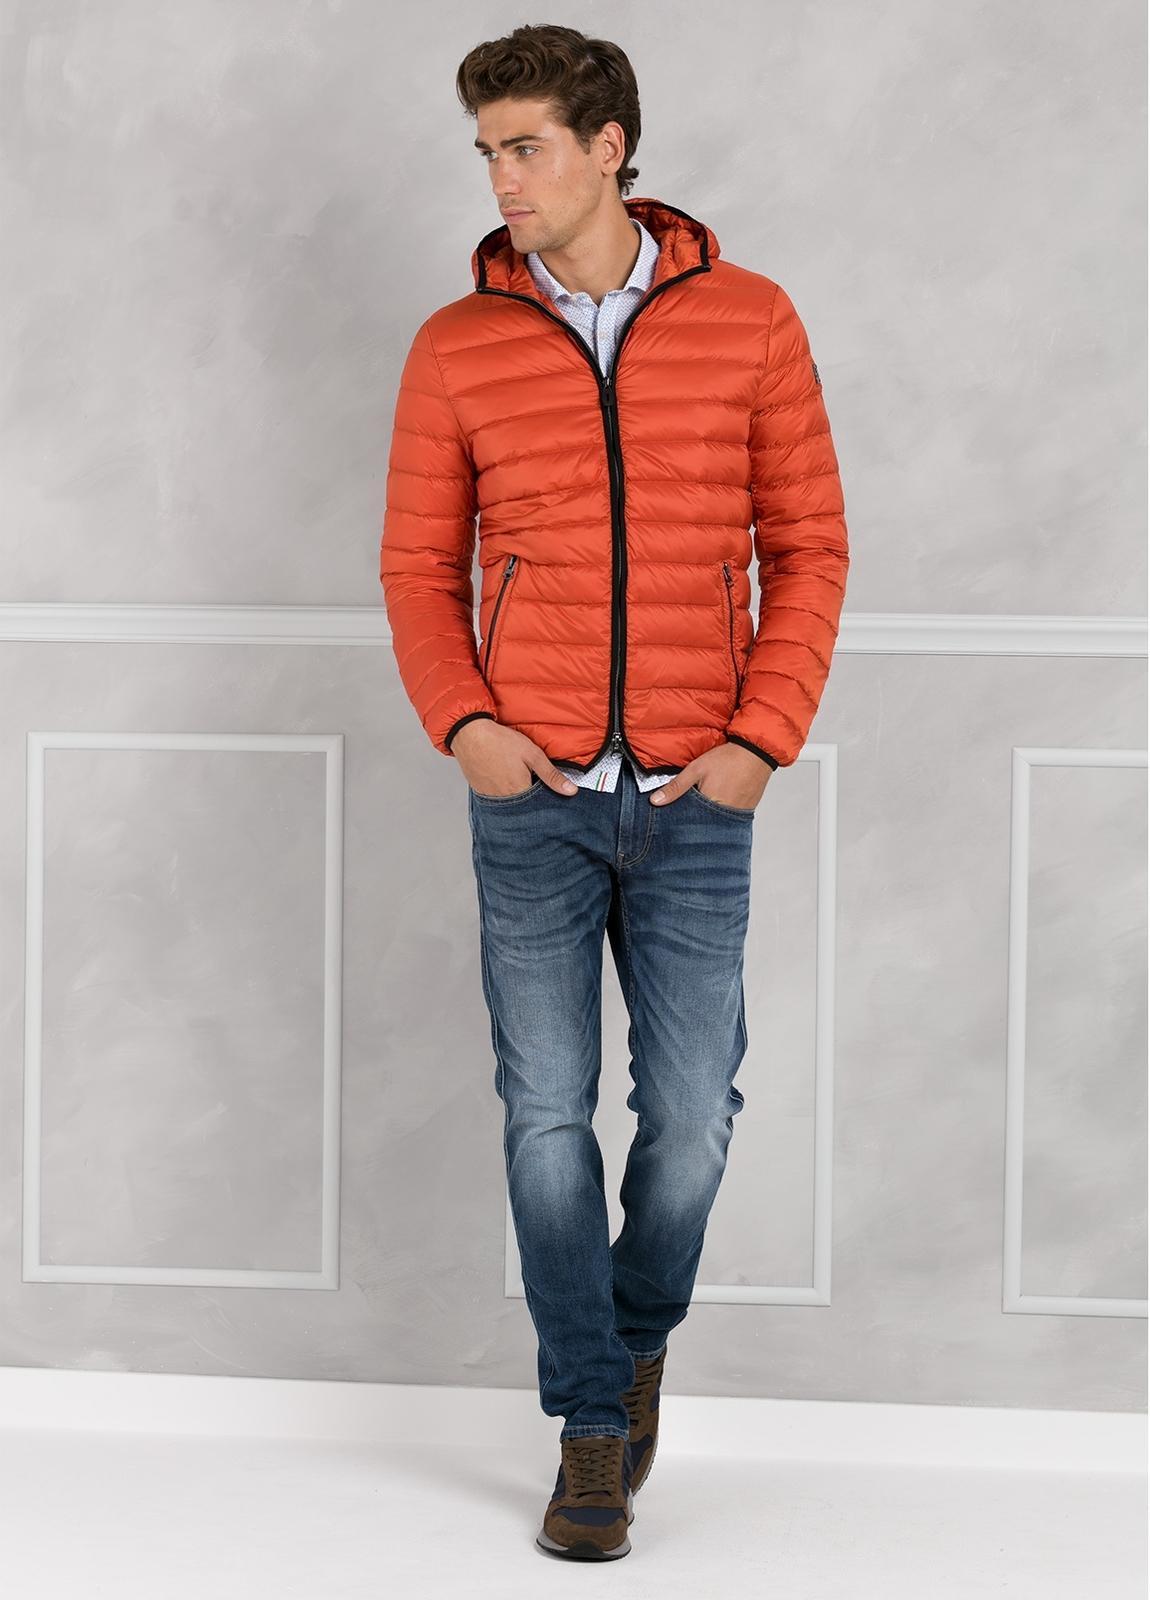 Chaqueta con capucha modelo ZEFIRO color naranja, tejido técnico.